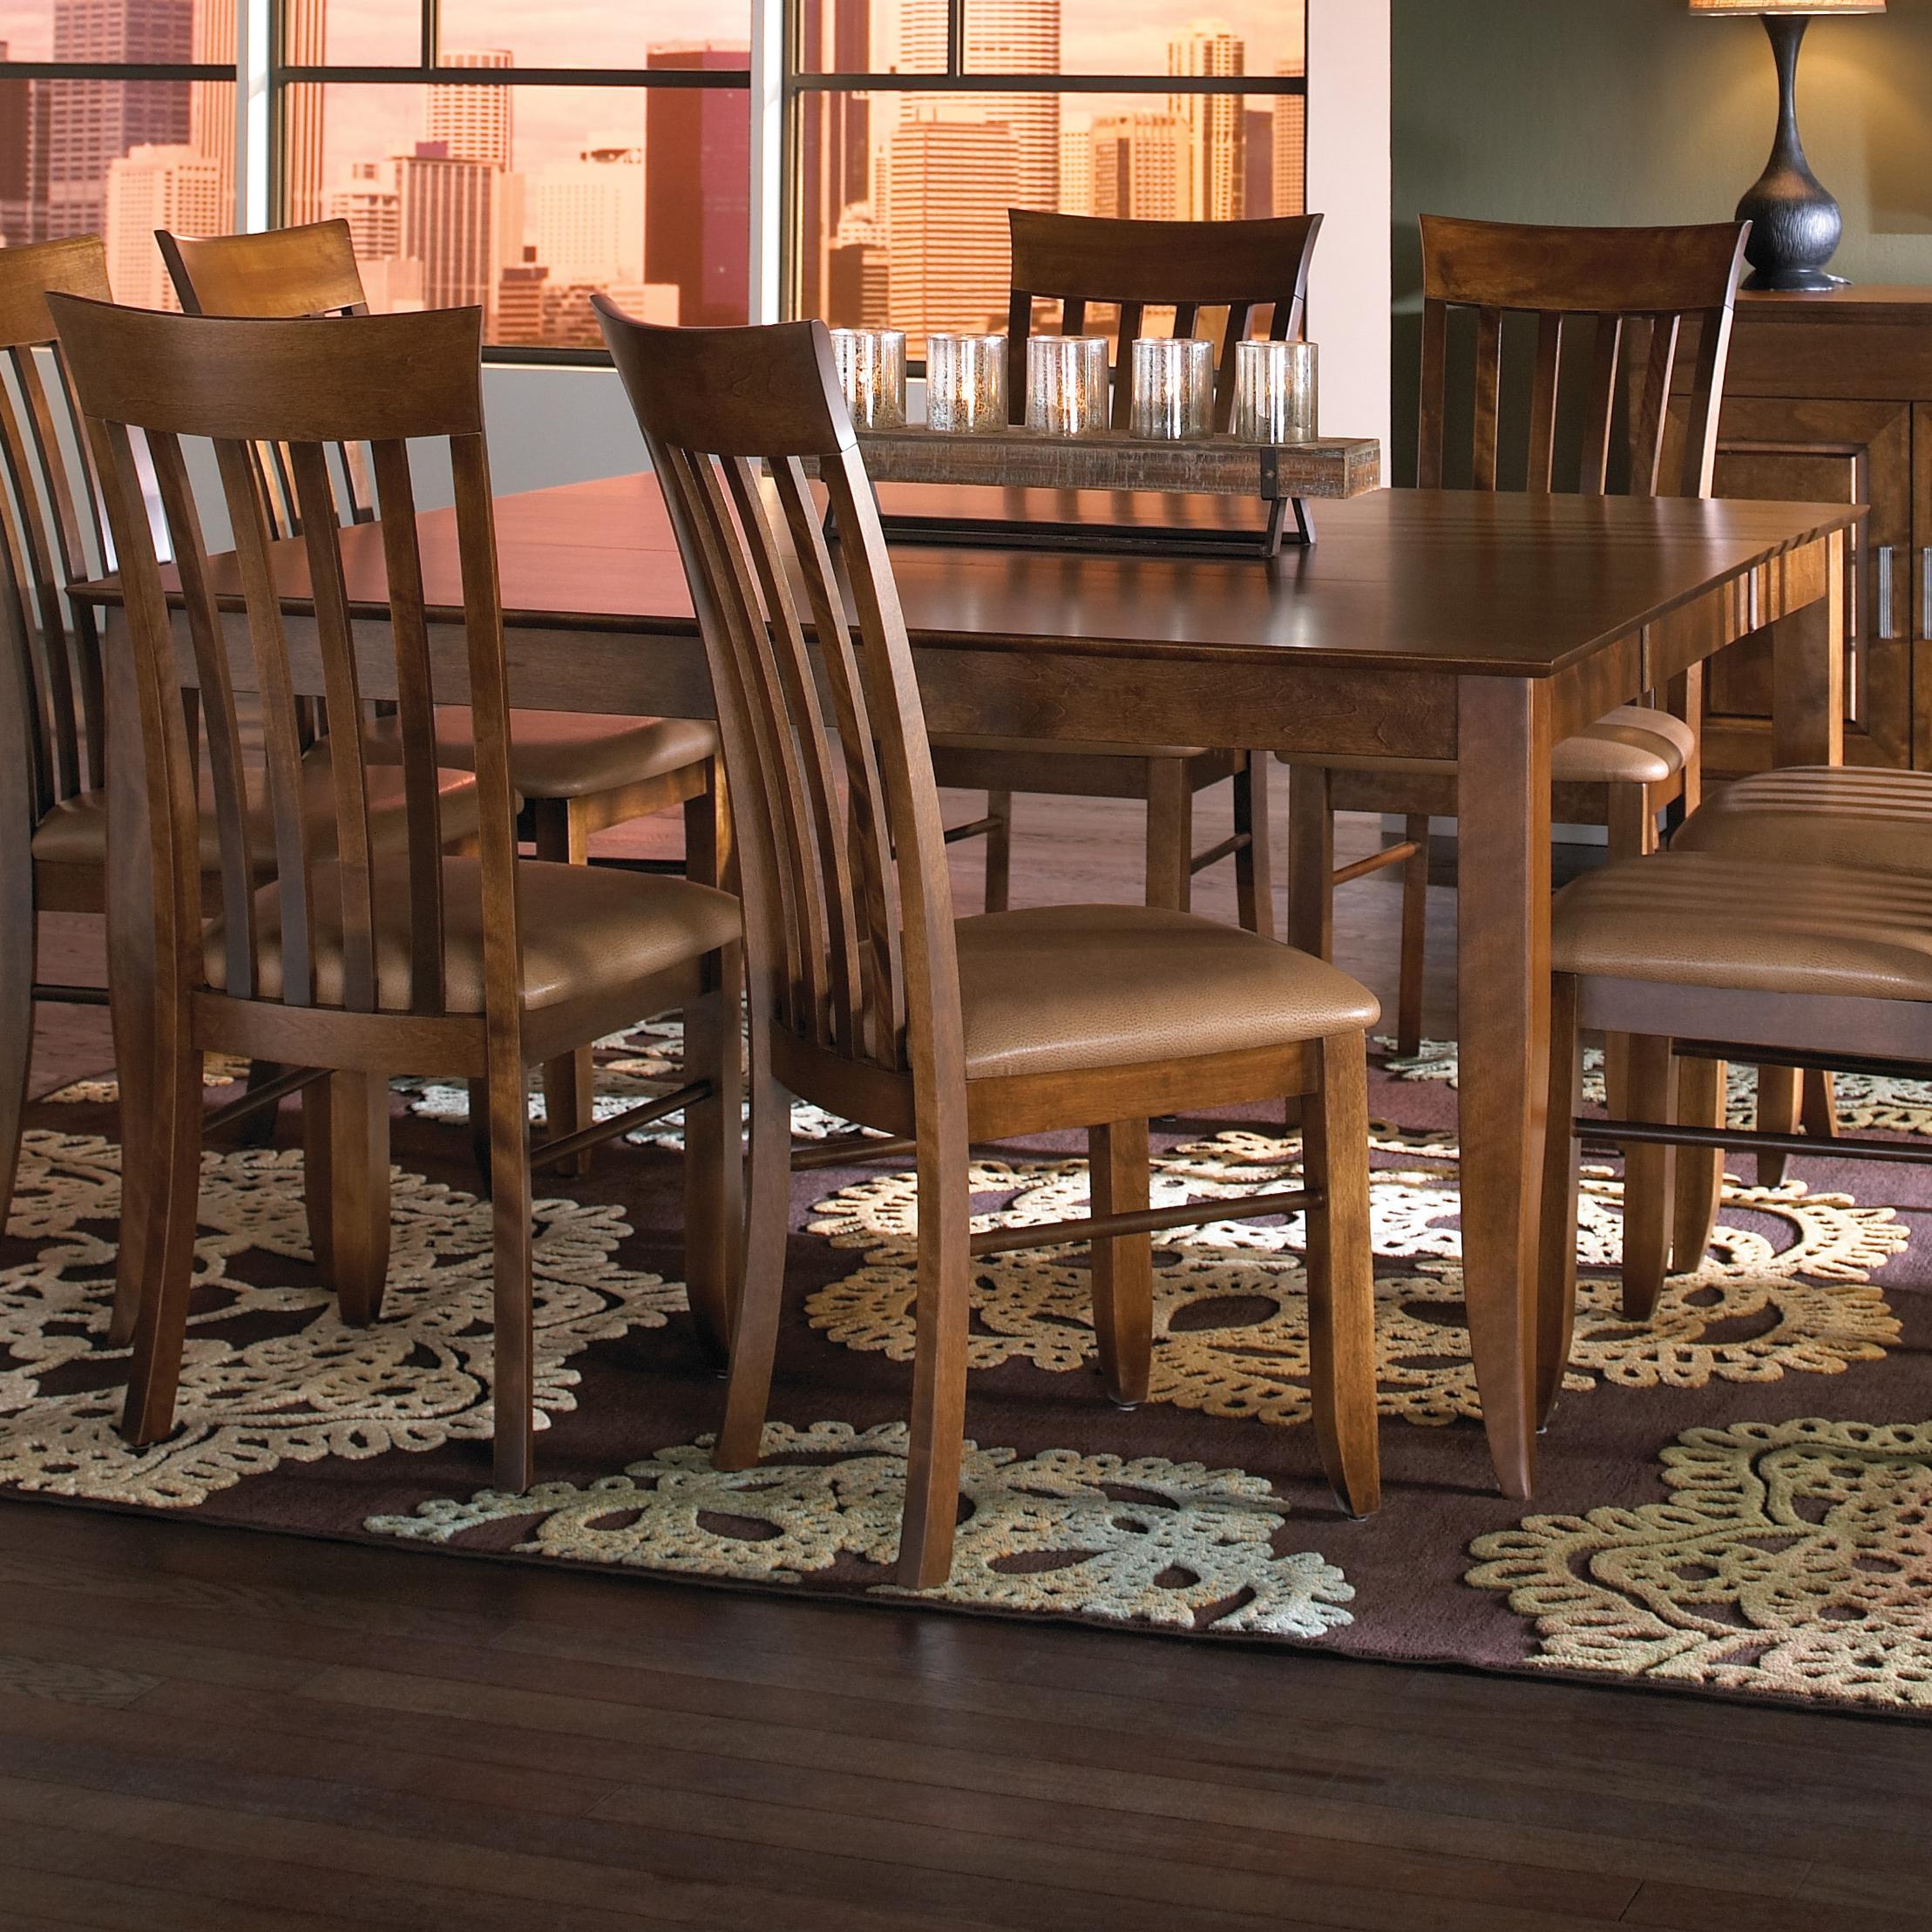 Canadel custom dining customizable rectangular table with for Rectangular dining room tables with leaves